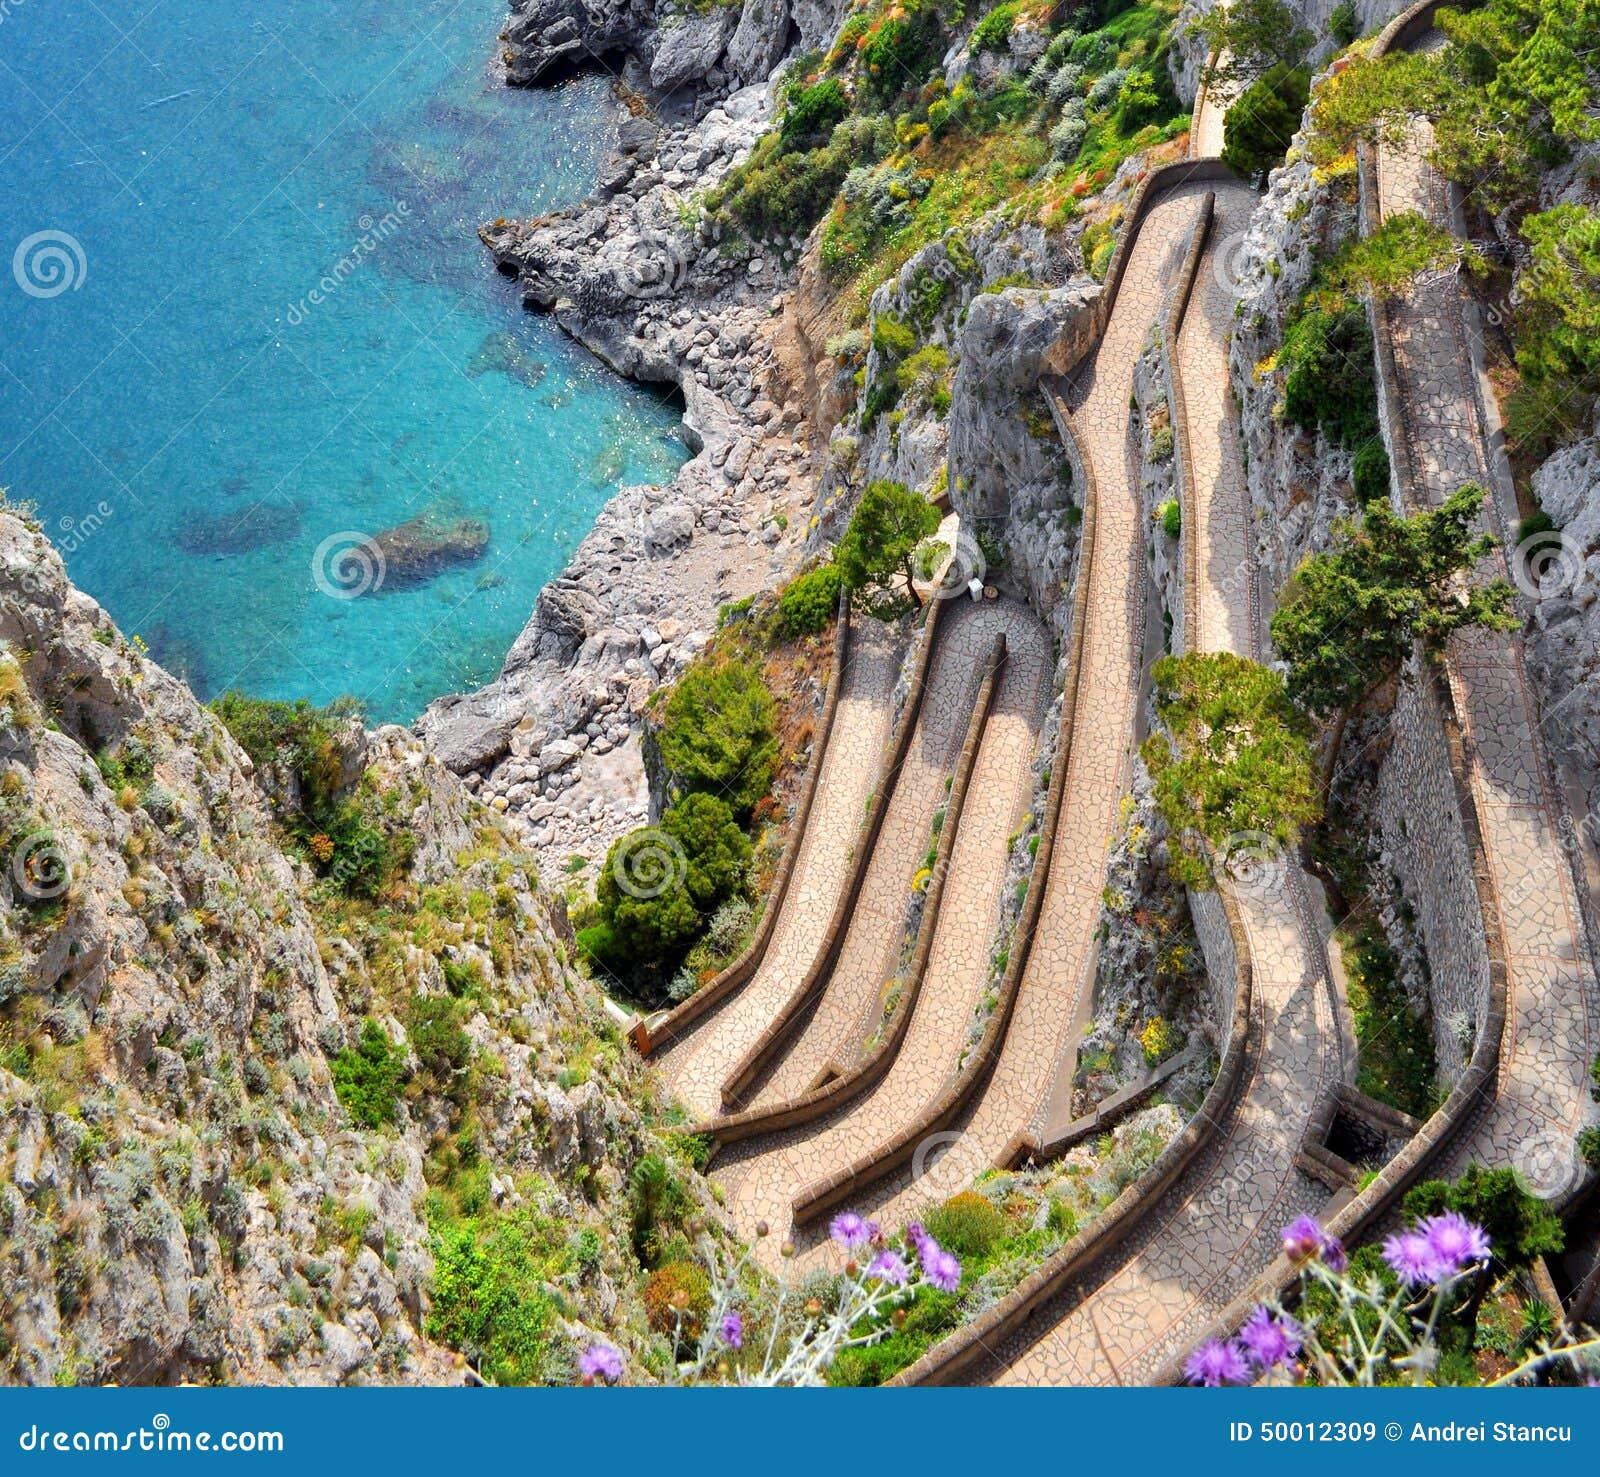 capri island via krupp stock image image of horizon 50012309 thumbs up symbol vector free thumbs up icon vector free download